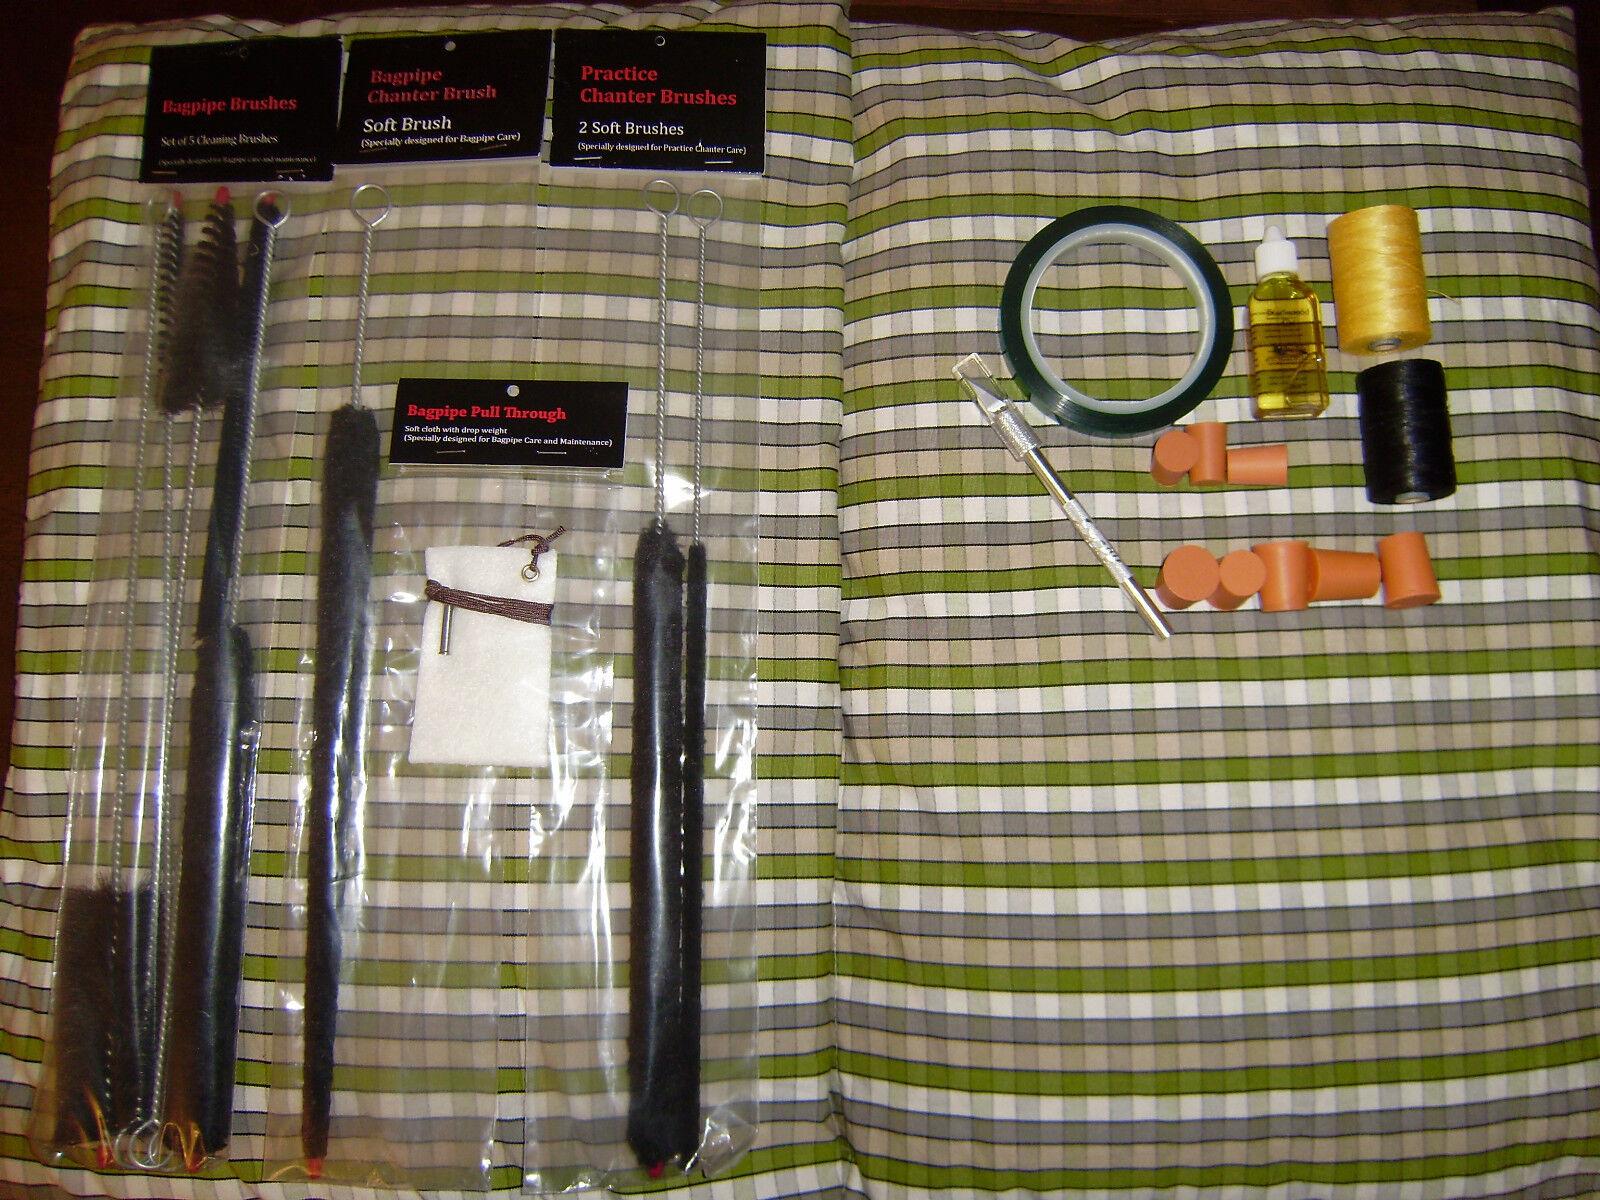 Bagpipe Maintenance Kit Various Choices Hemp Tape Tape Tape Brushes Tutor Book etc 3f2766